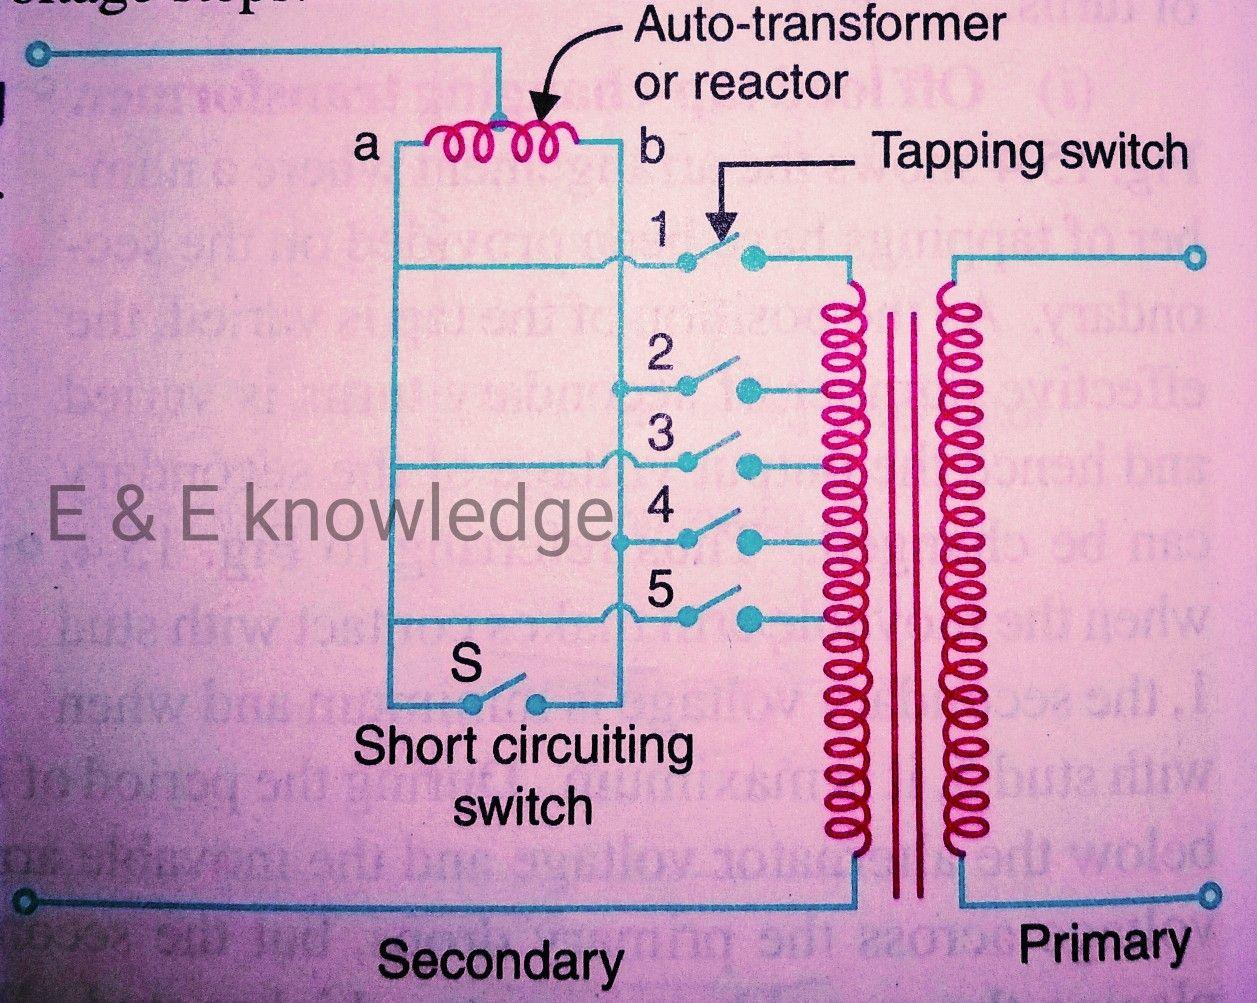 Auto Transformer Tap Changing Auto Transformer Transformers Auto